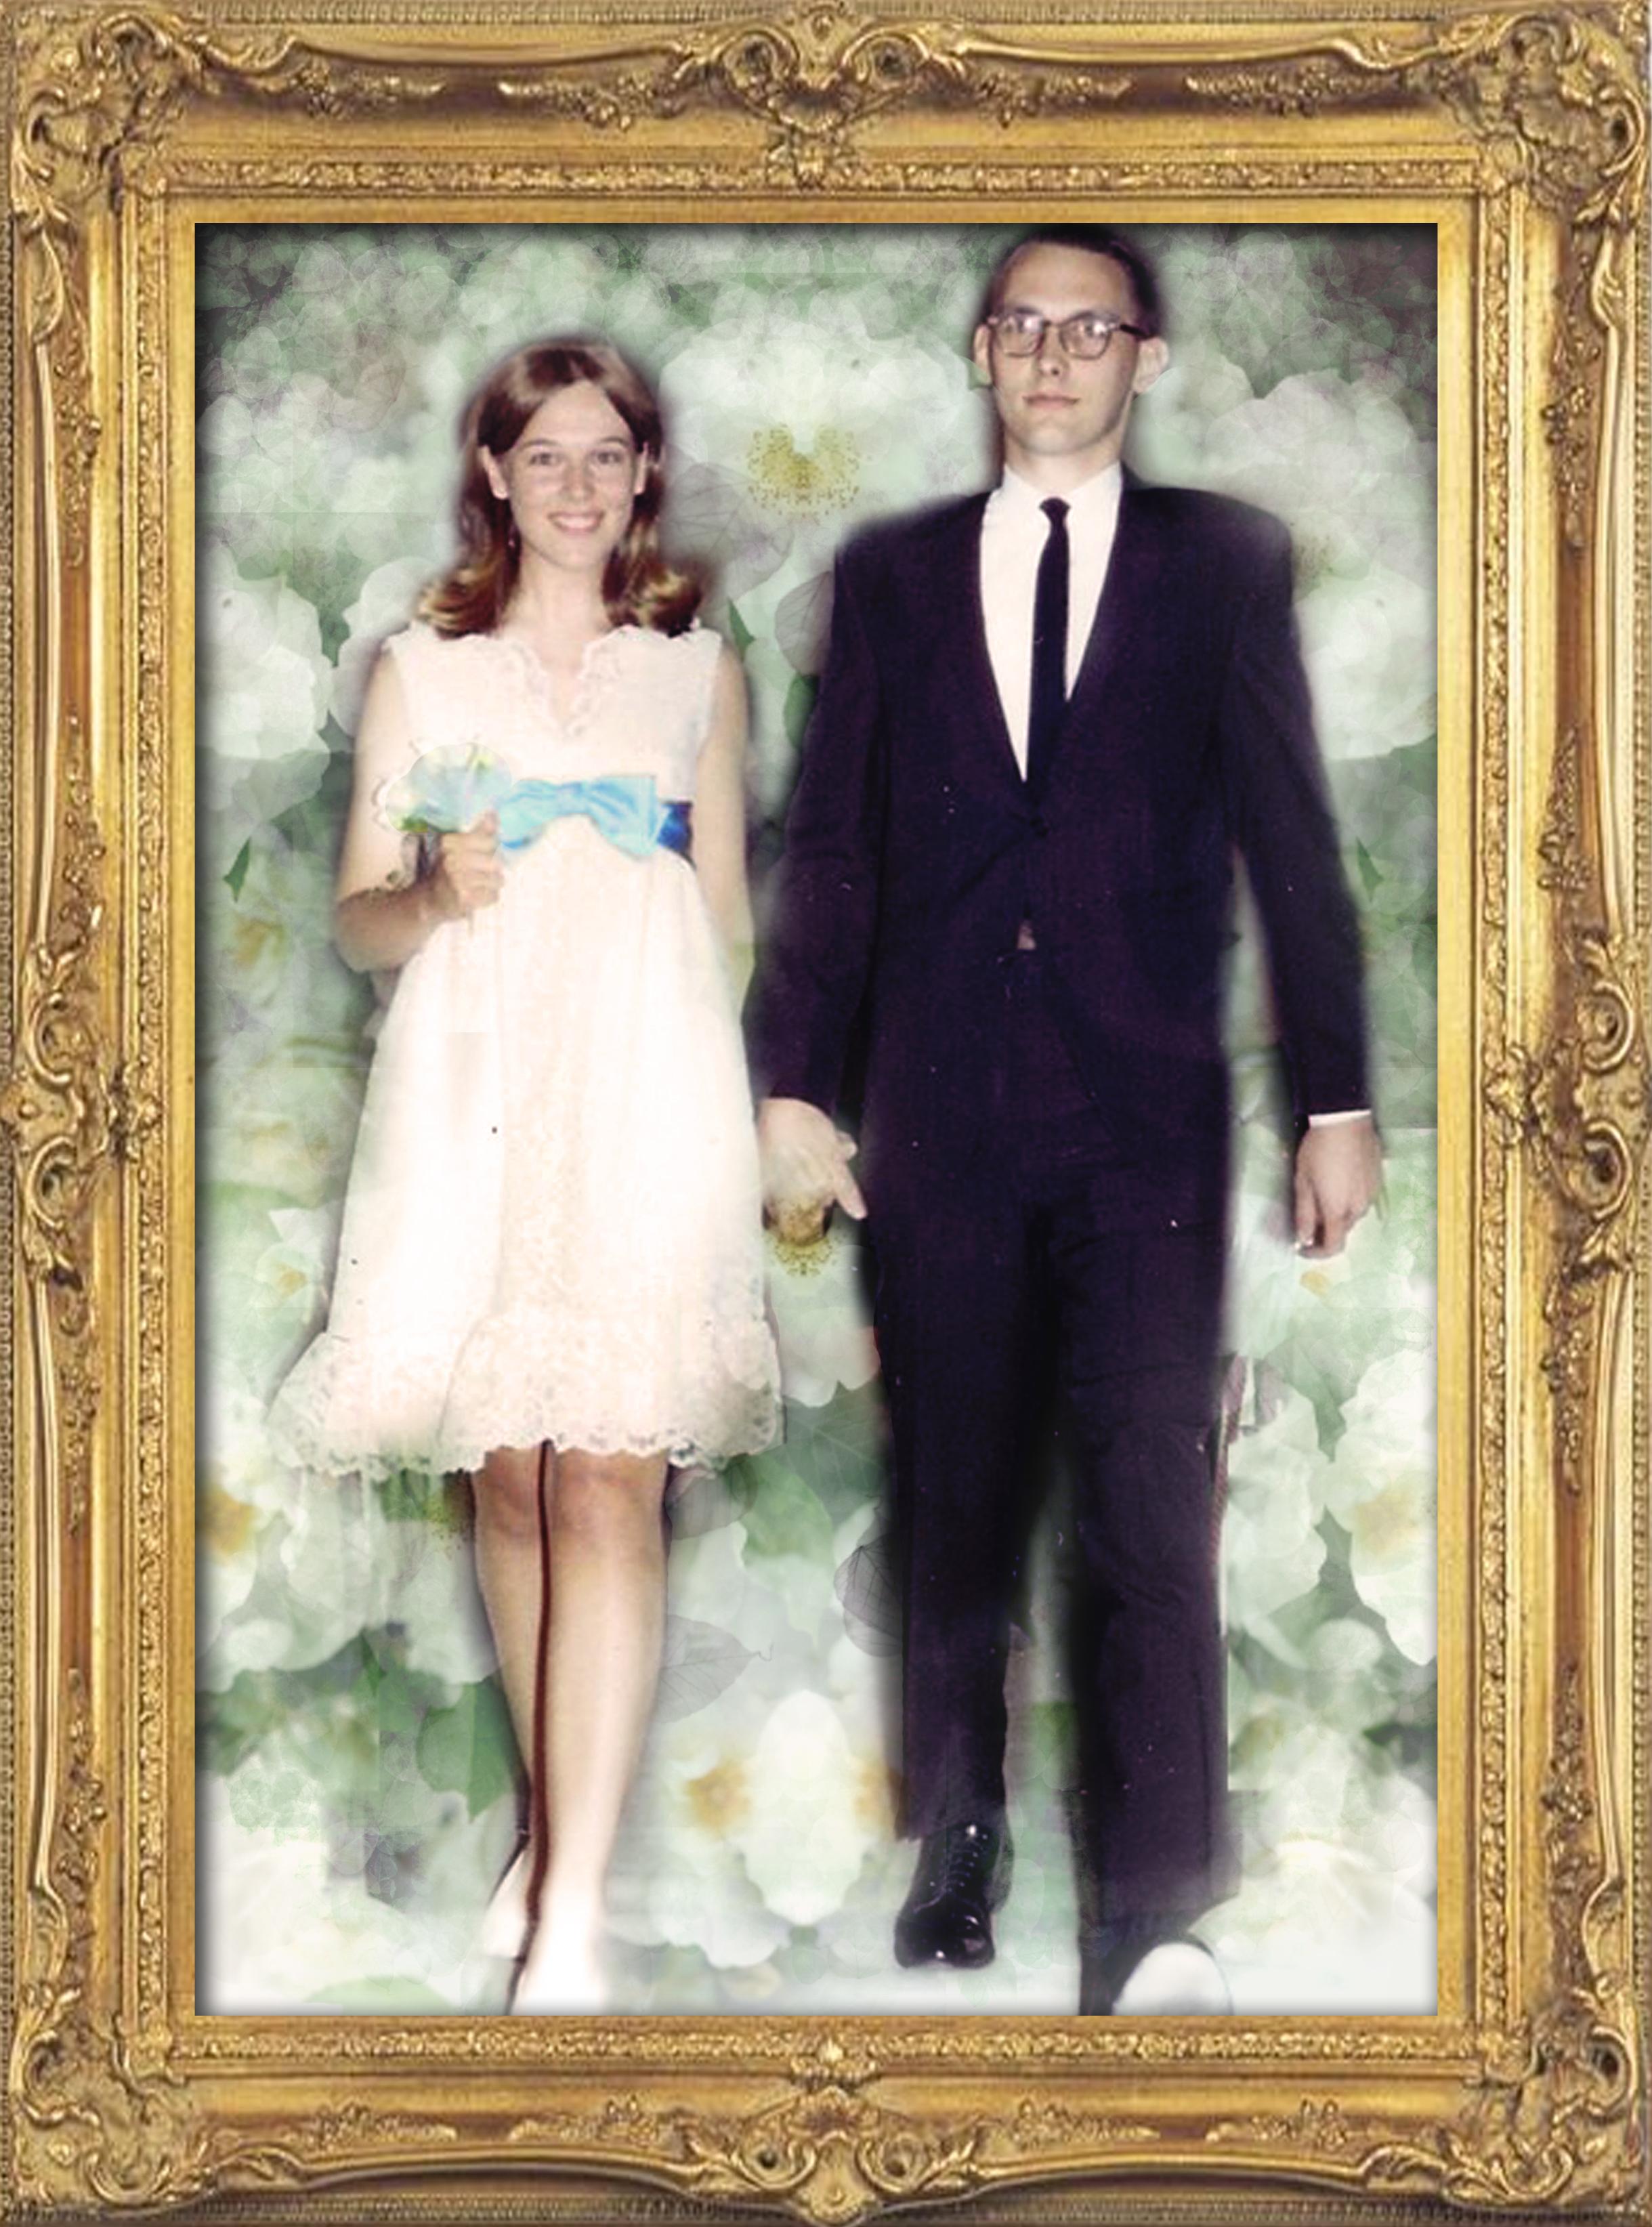 My Parents' Wedding Photo